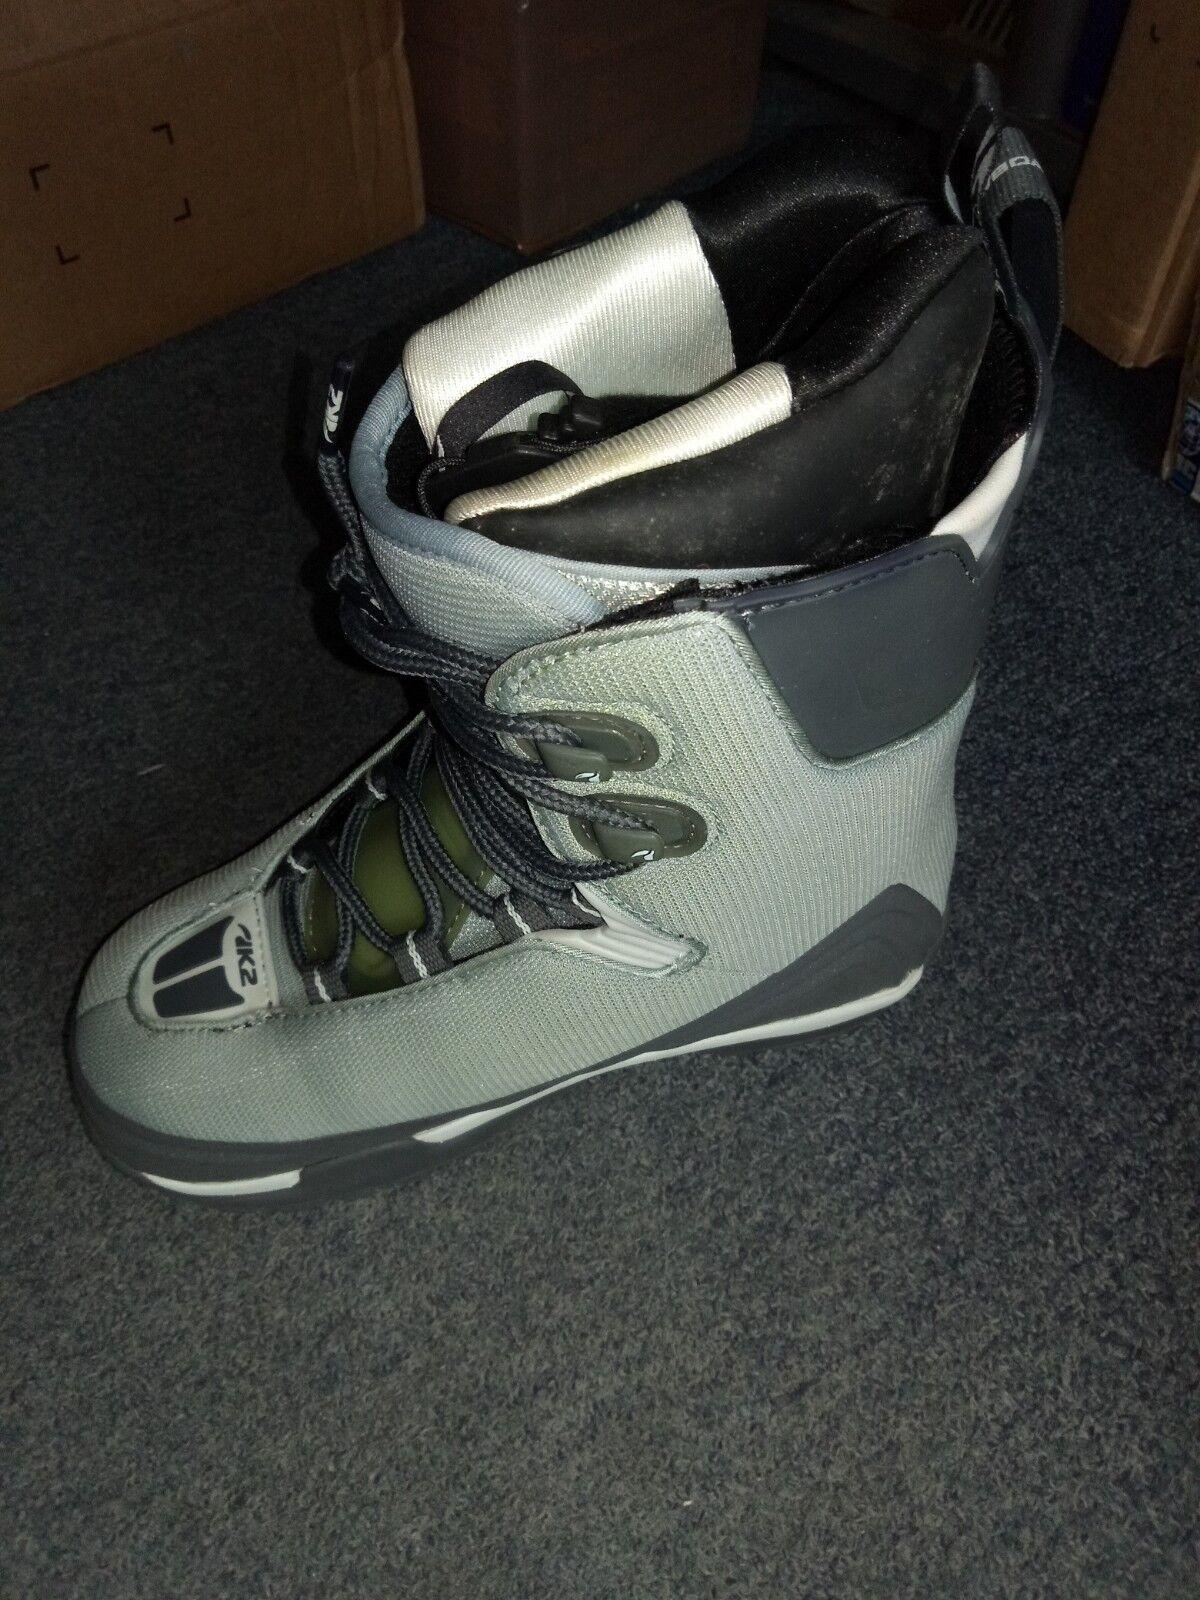 Womens Snowboard Boots Size 7US (UK5)K2 Cirque